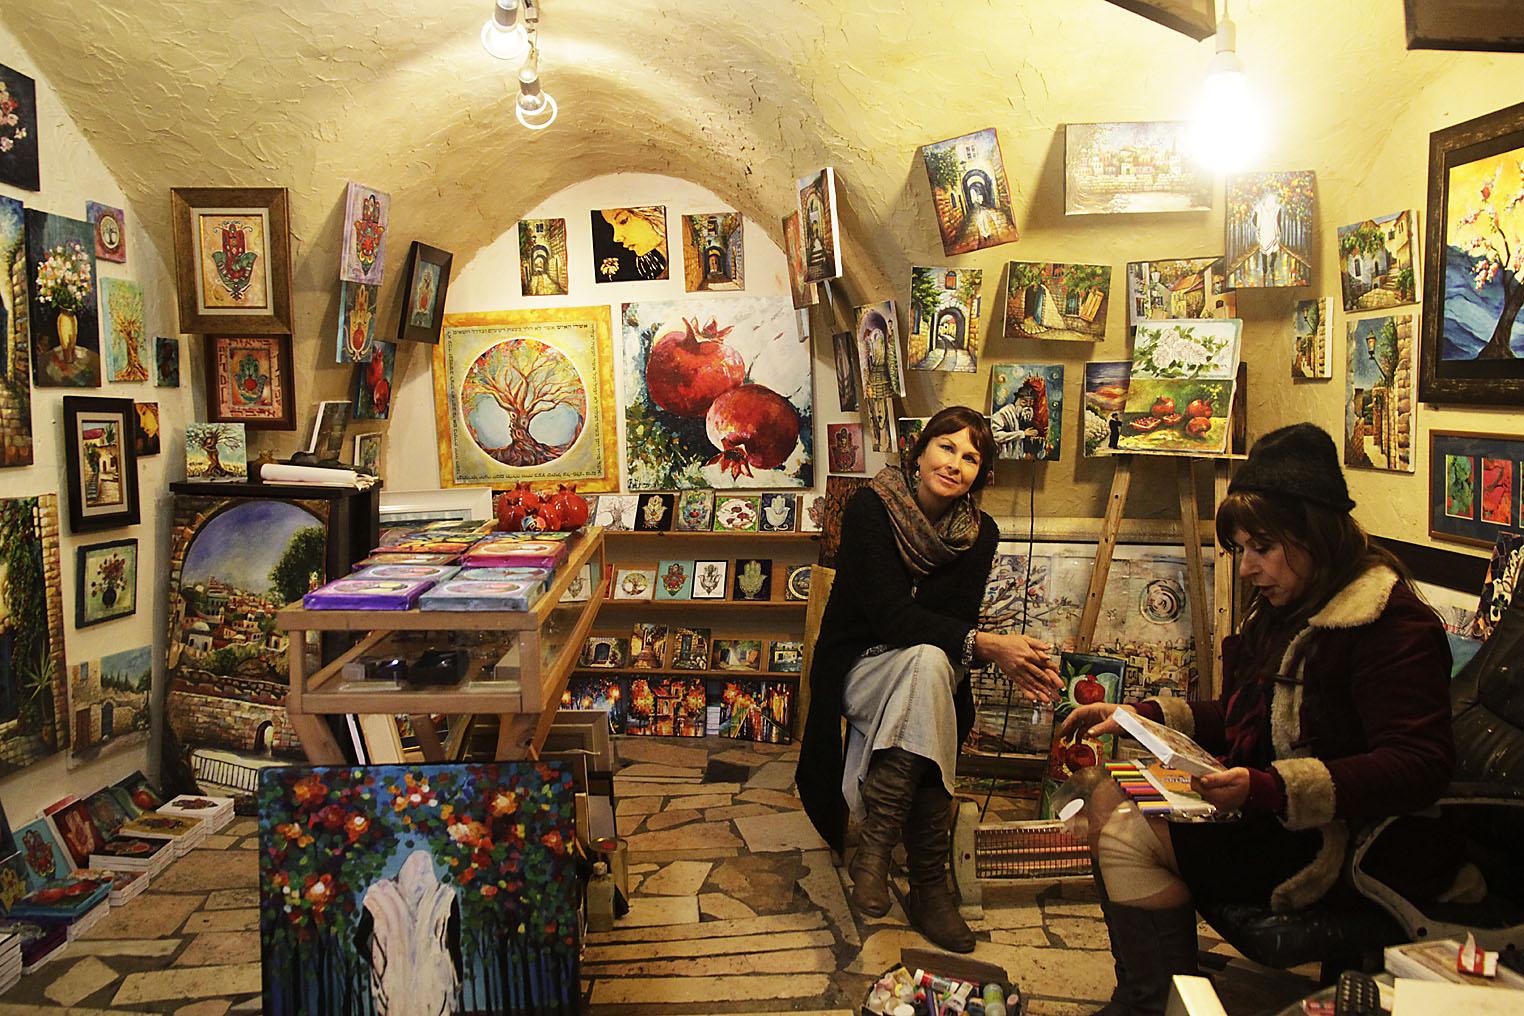 Tzfat, Idit Aharon, Artist